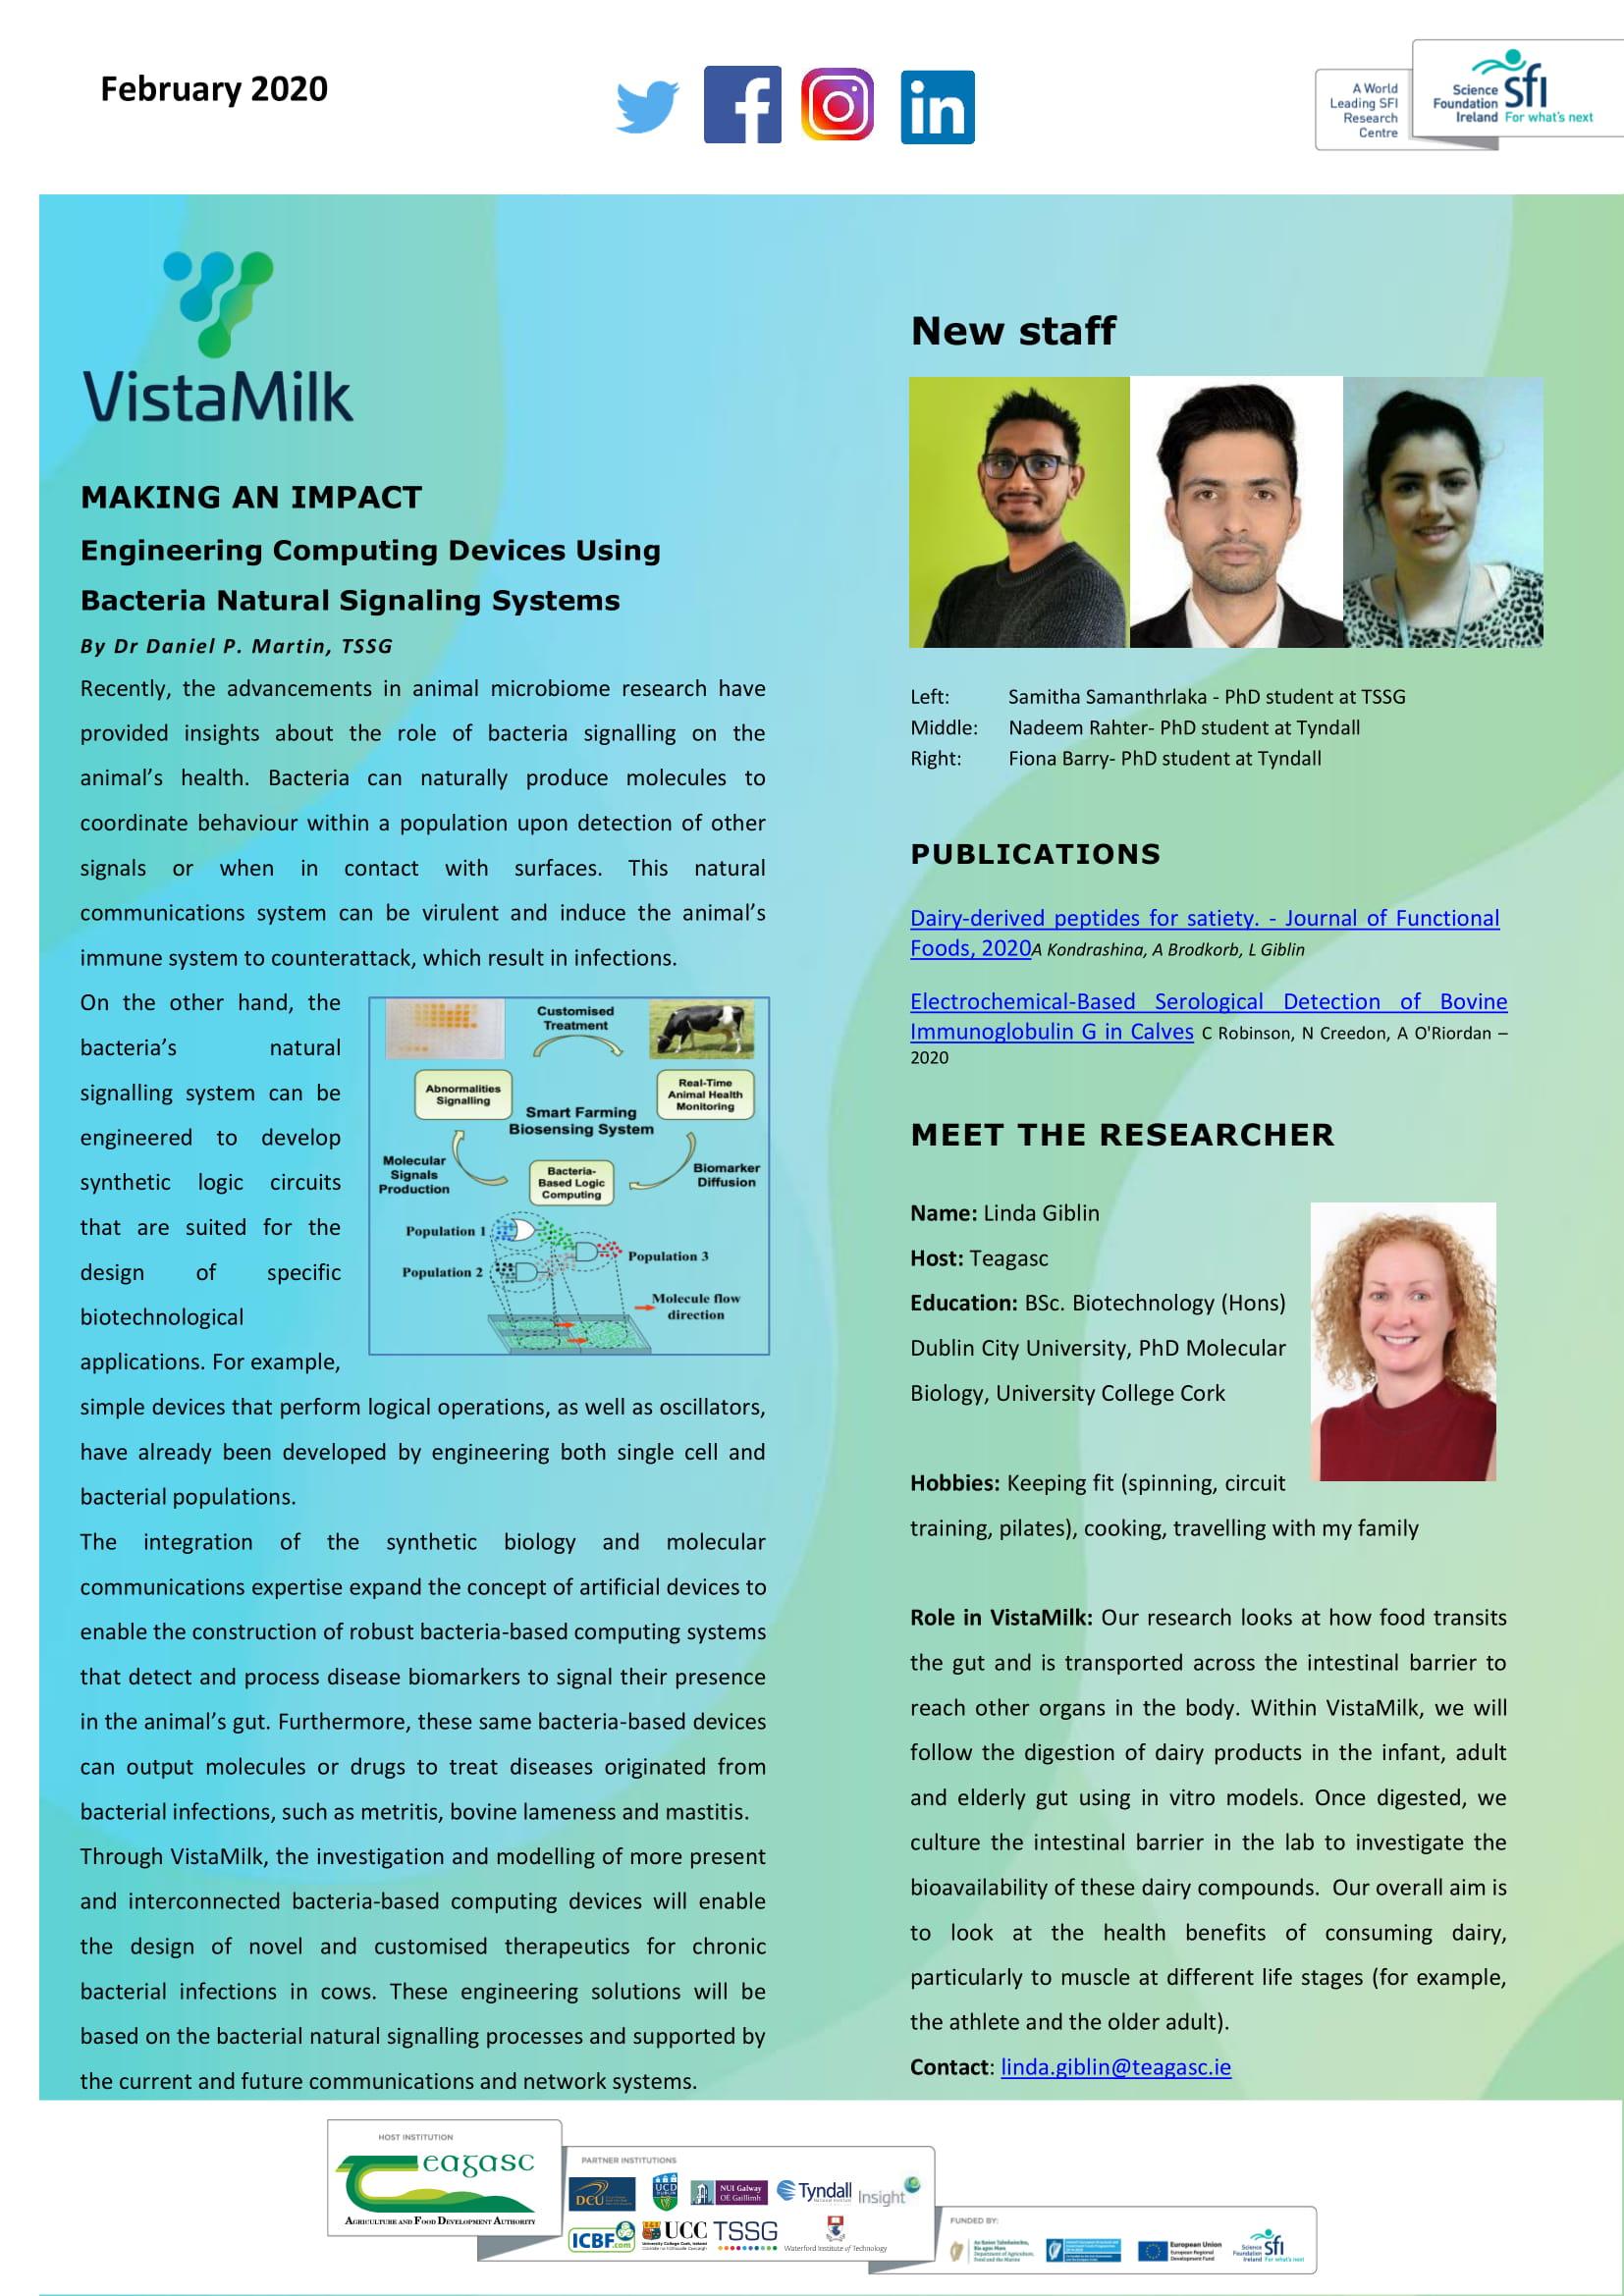 Vista Milk February 2020 Updates | VistaMilk